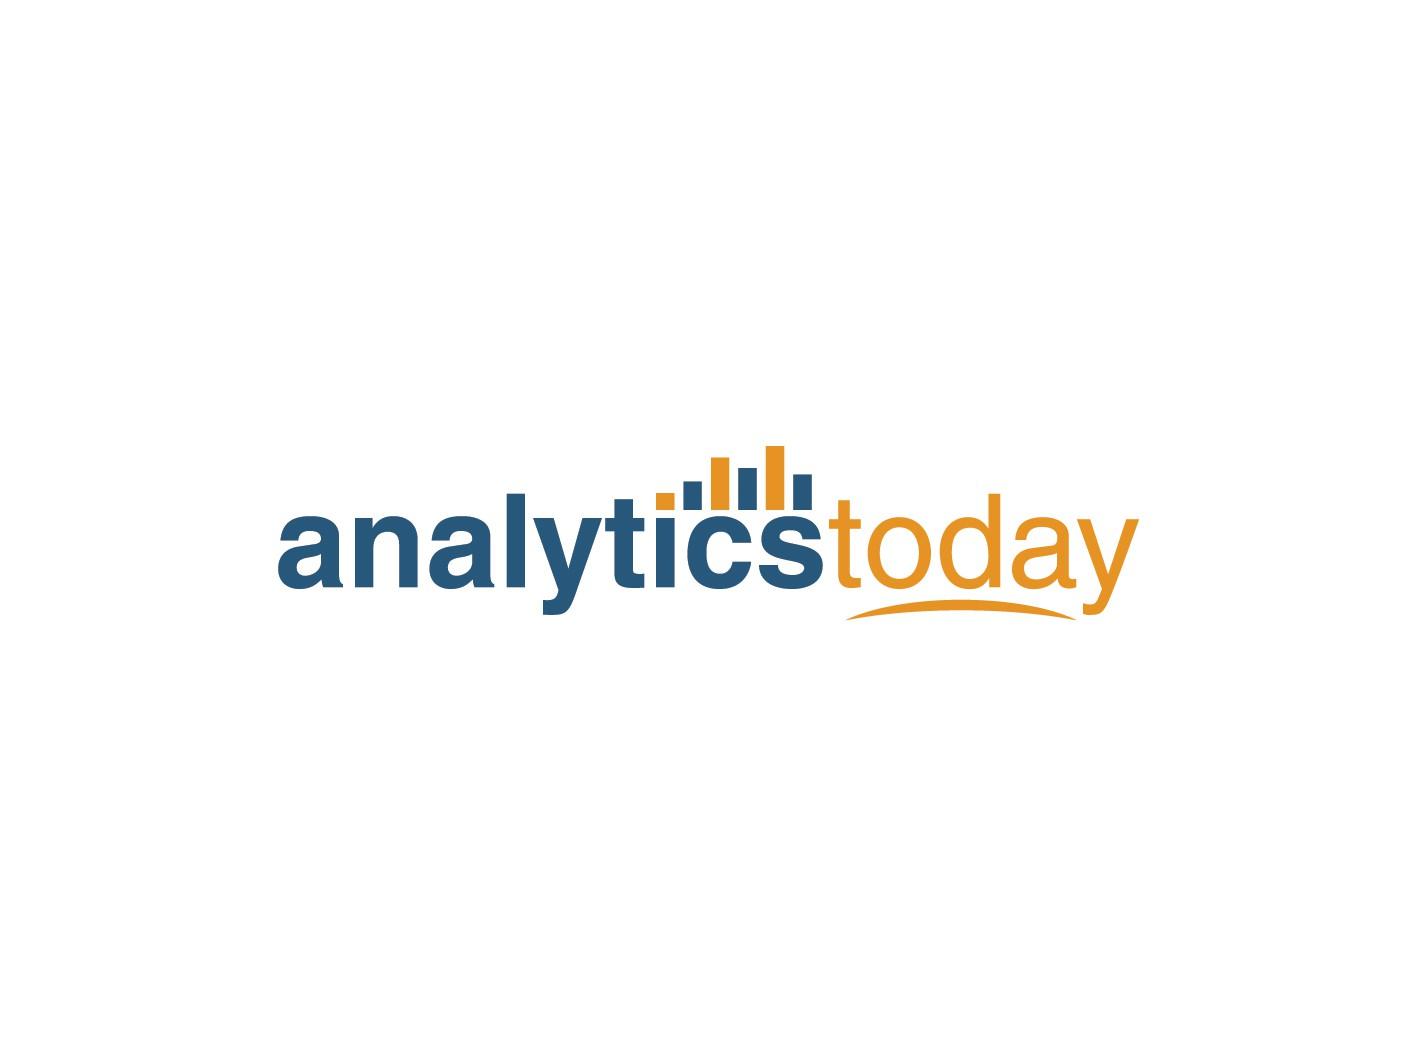 Business Analytics website logo